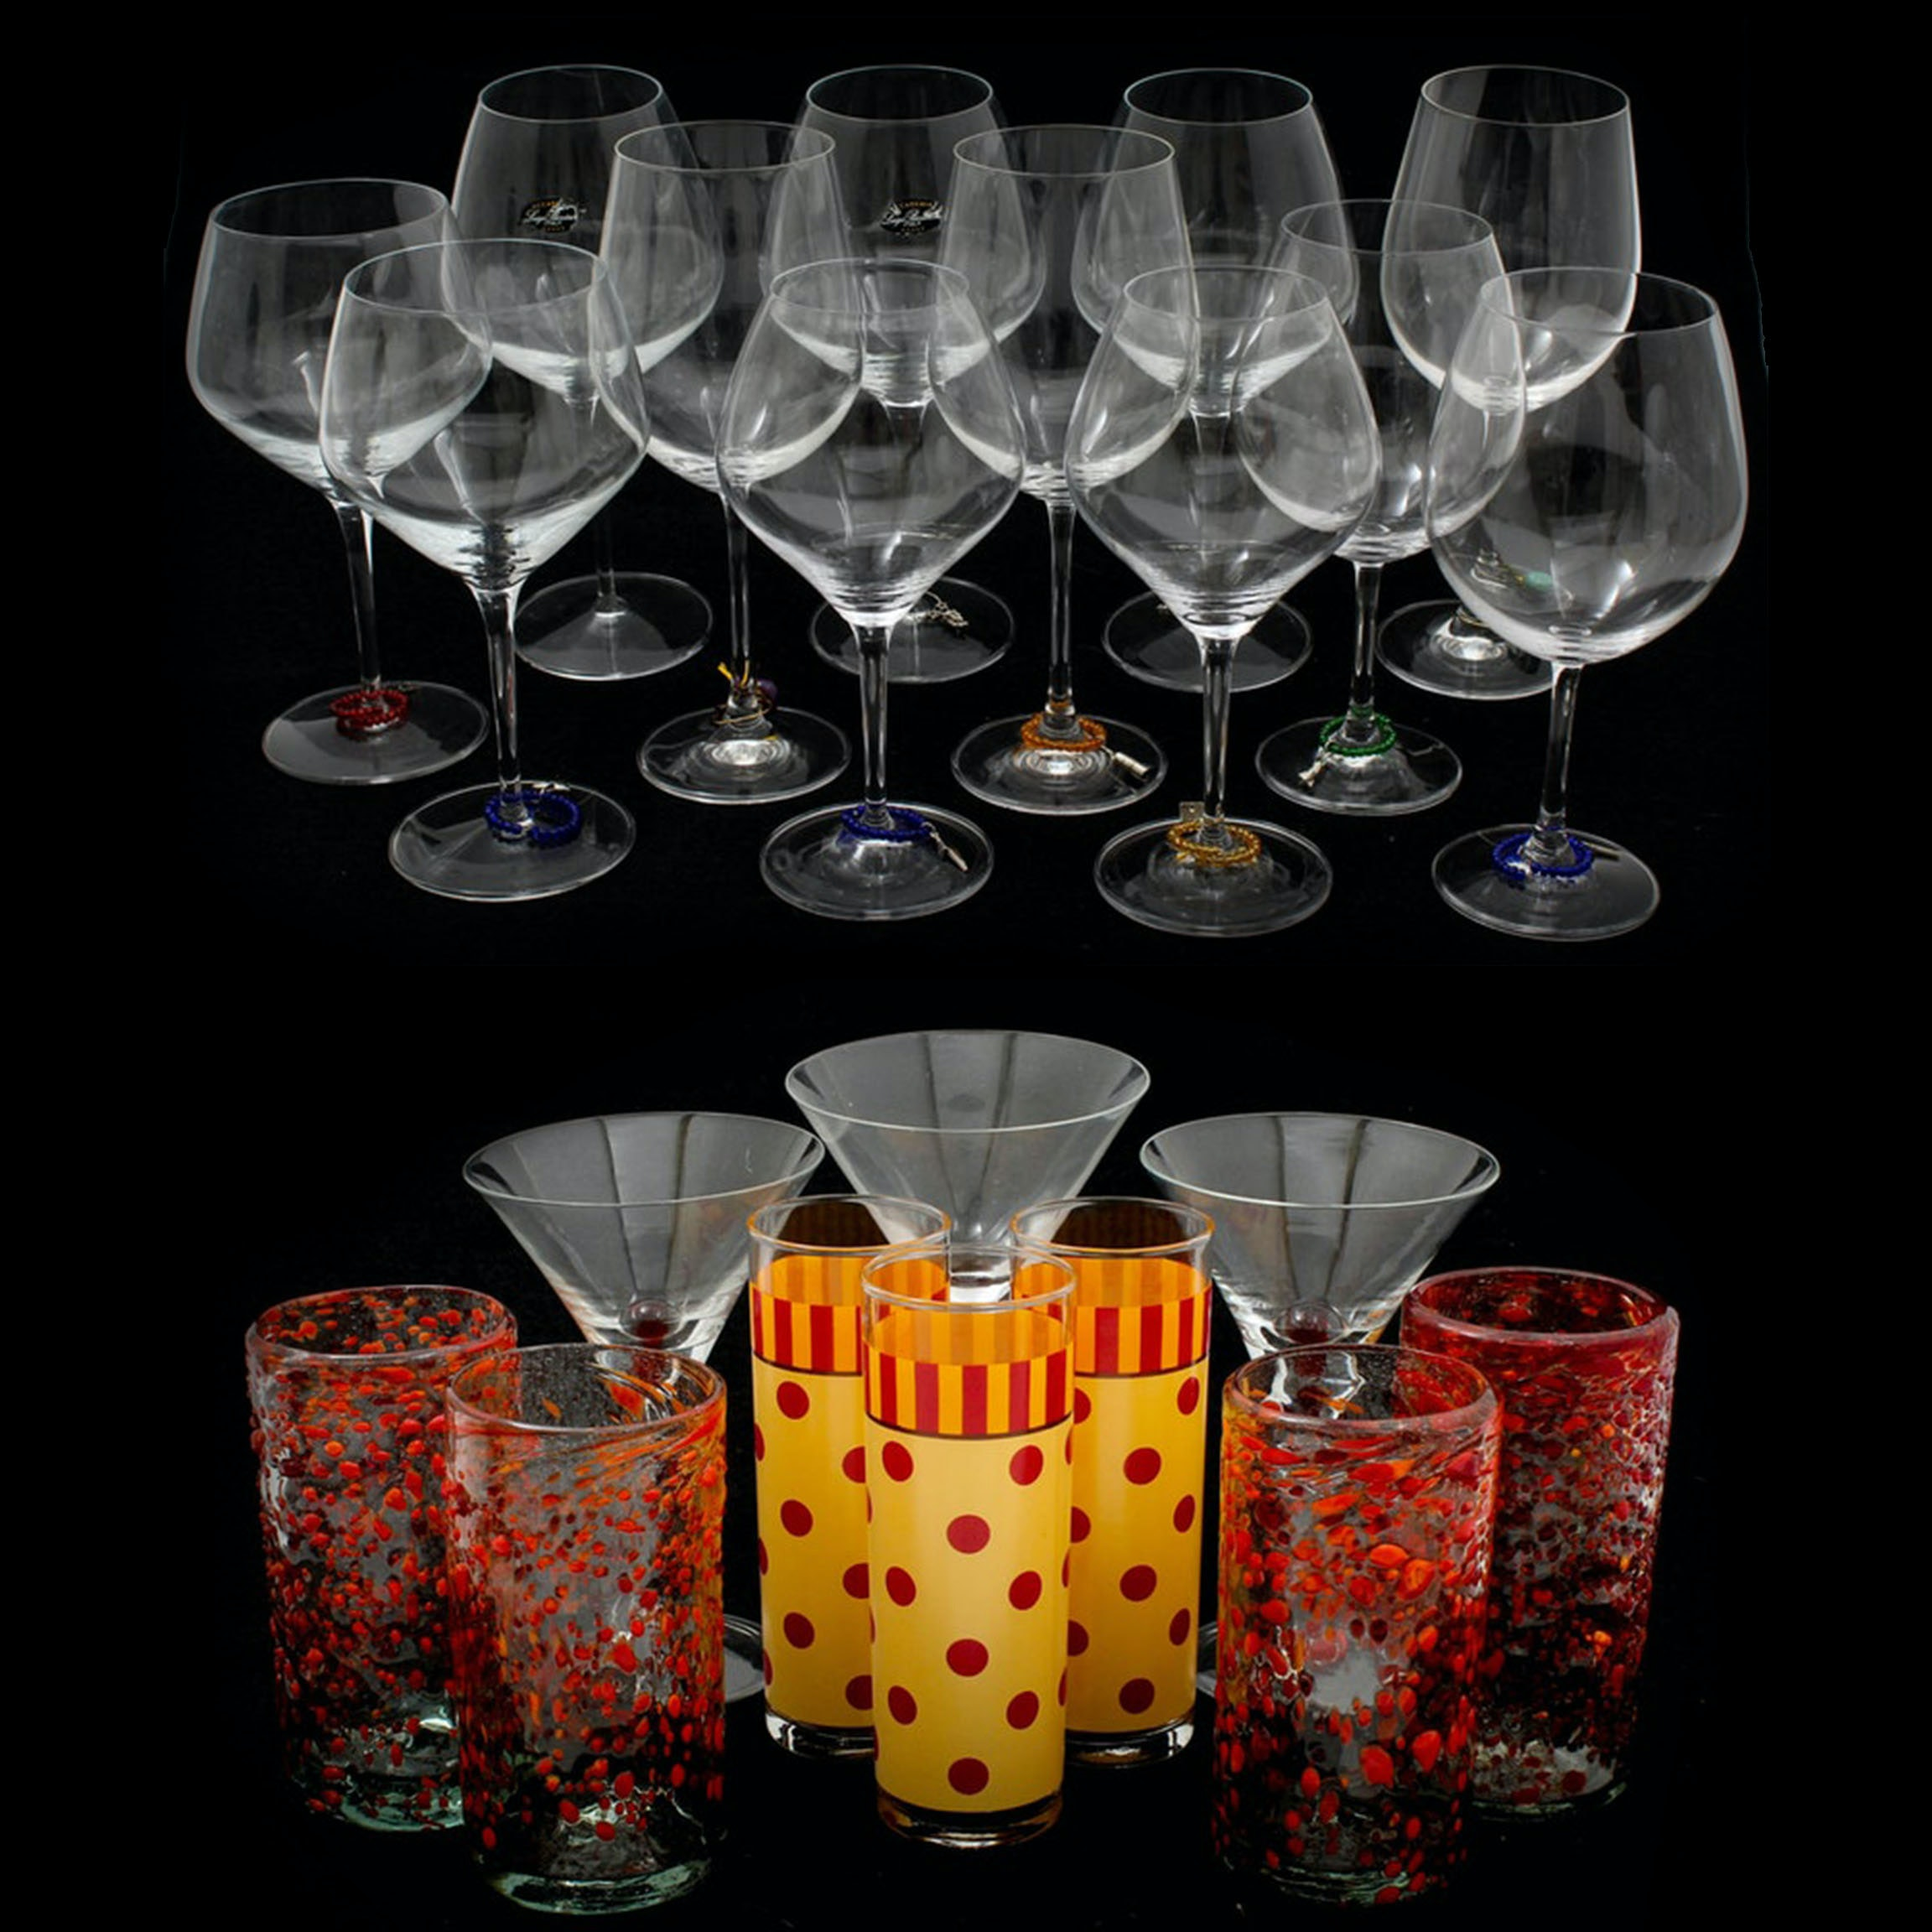 Wine Glasses and Decorative Tumblers